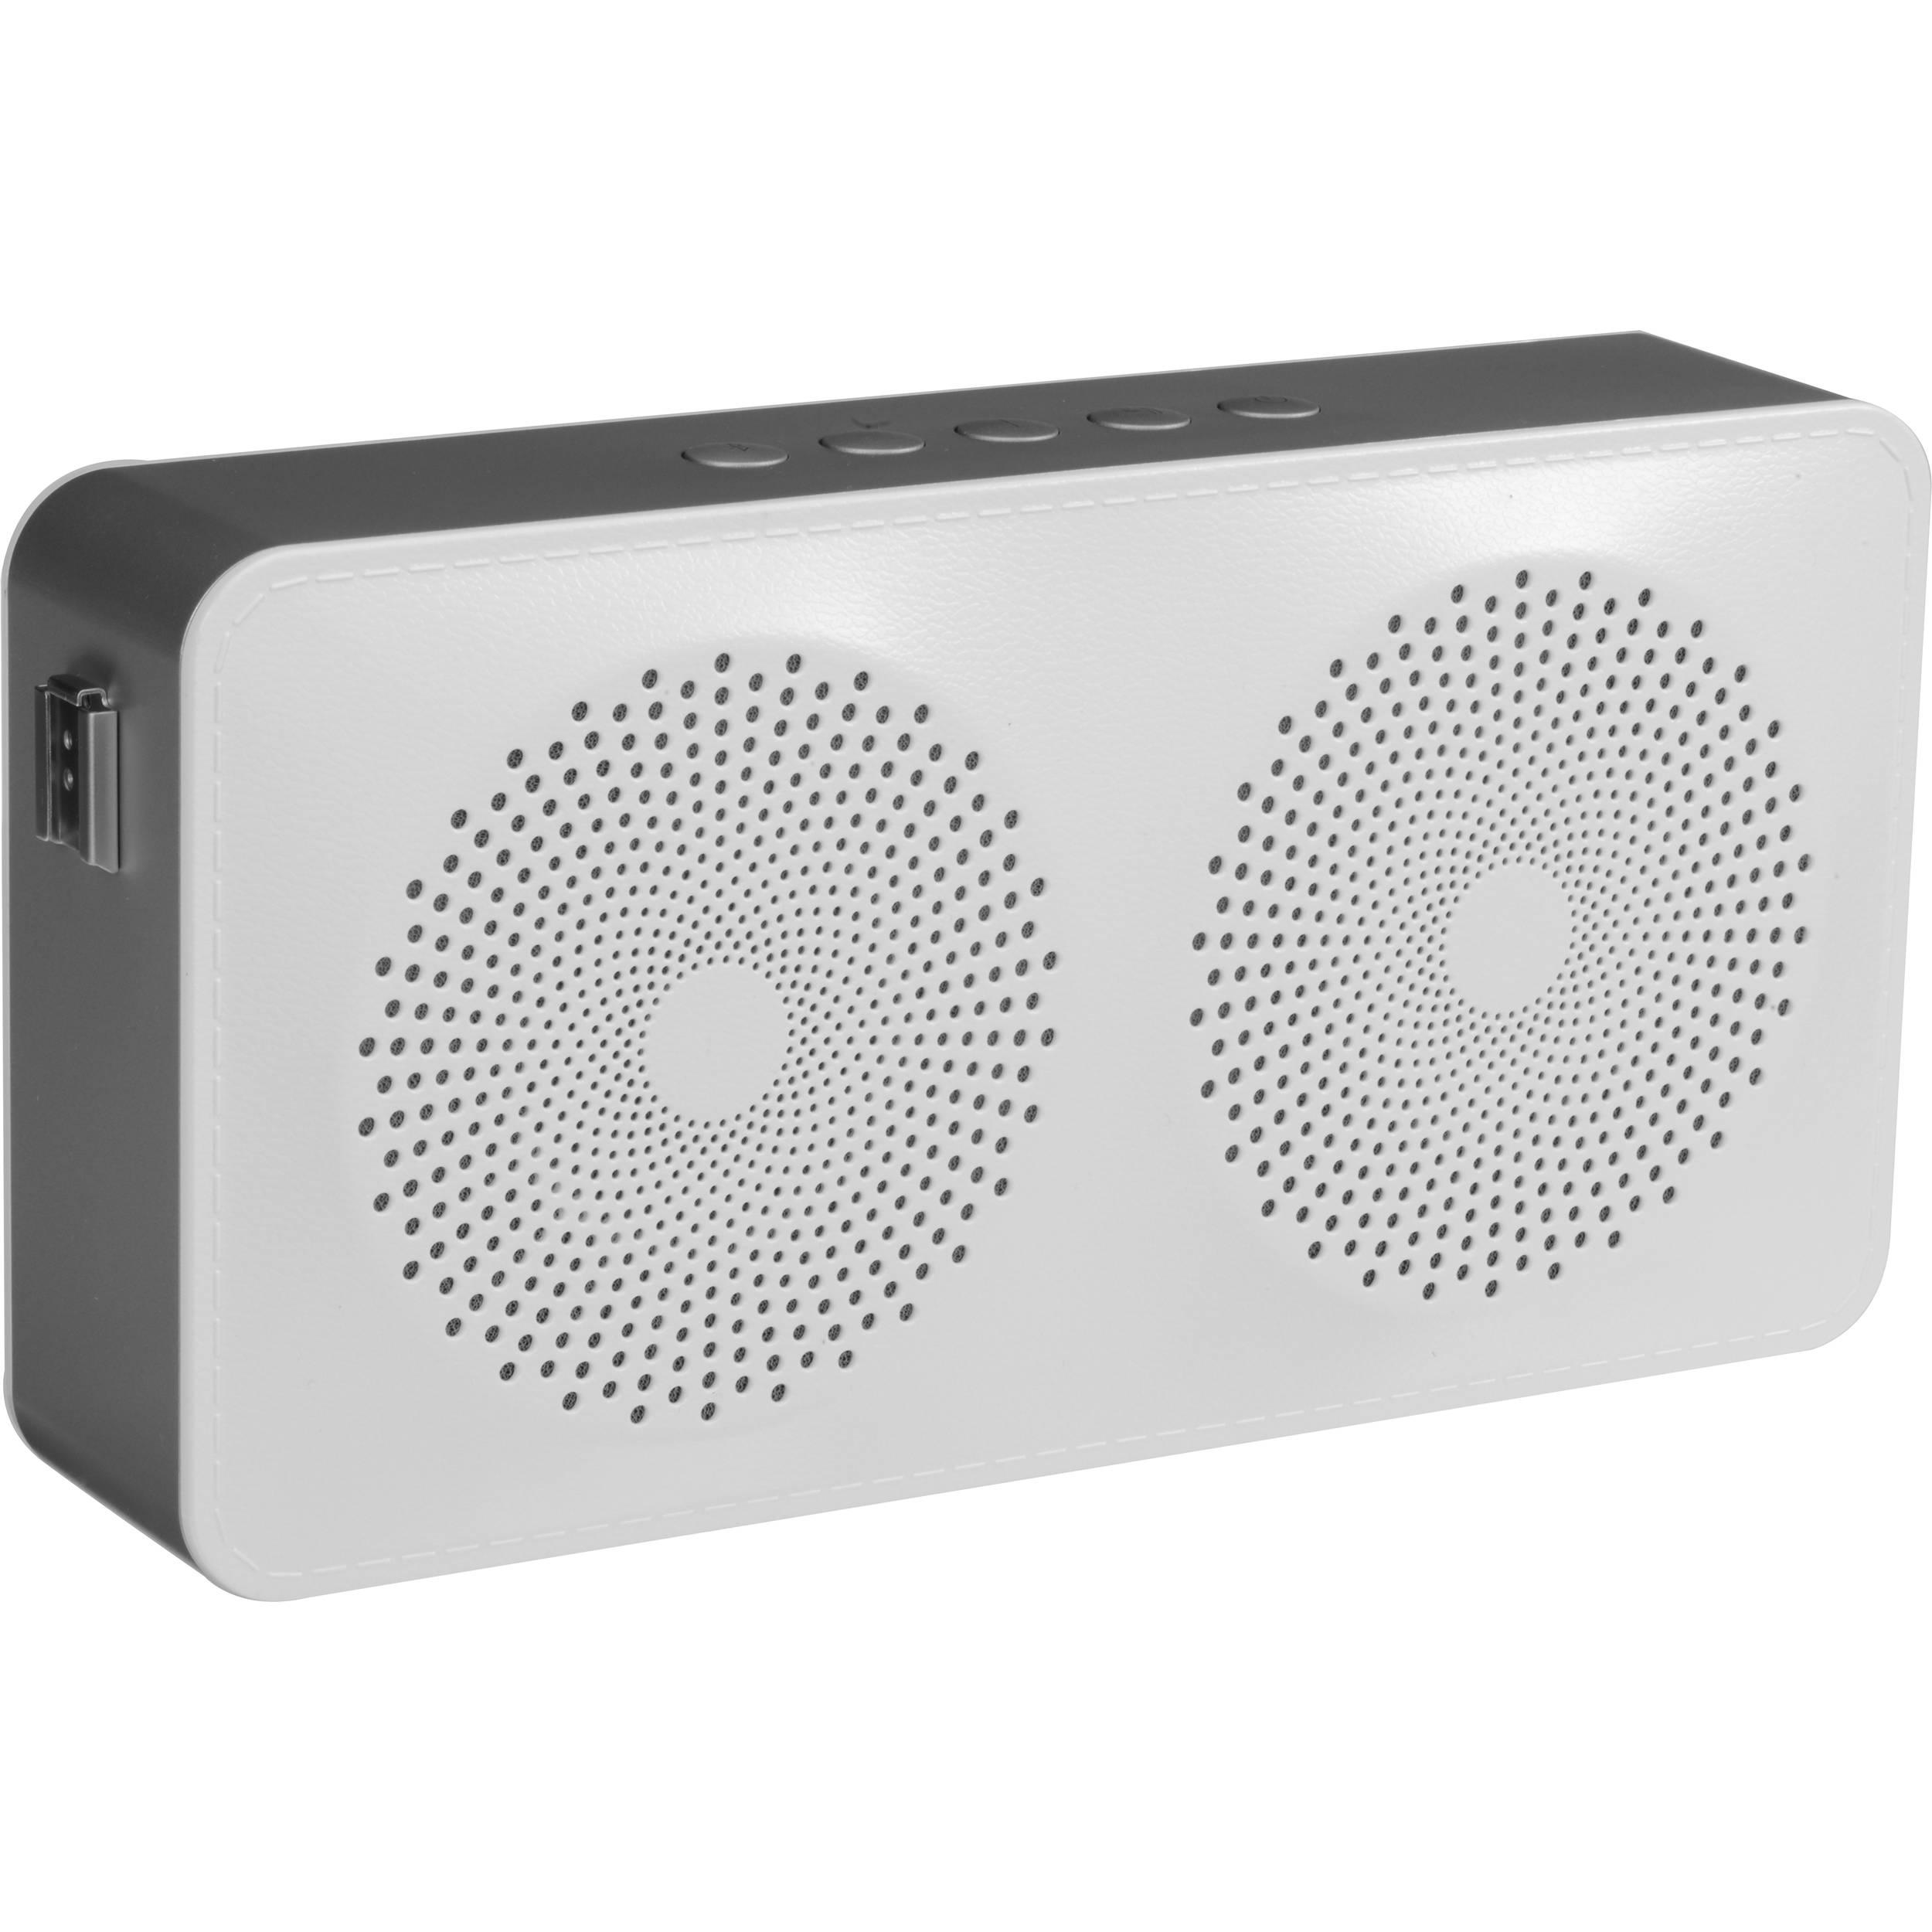 Hitachi BTN8 Portable Bluetooth Speaker (White, Large)